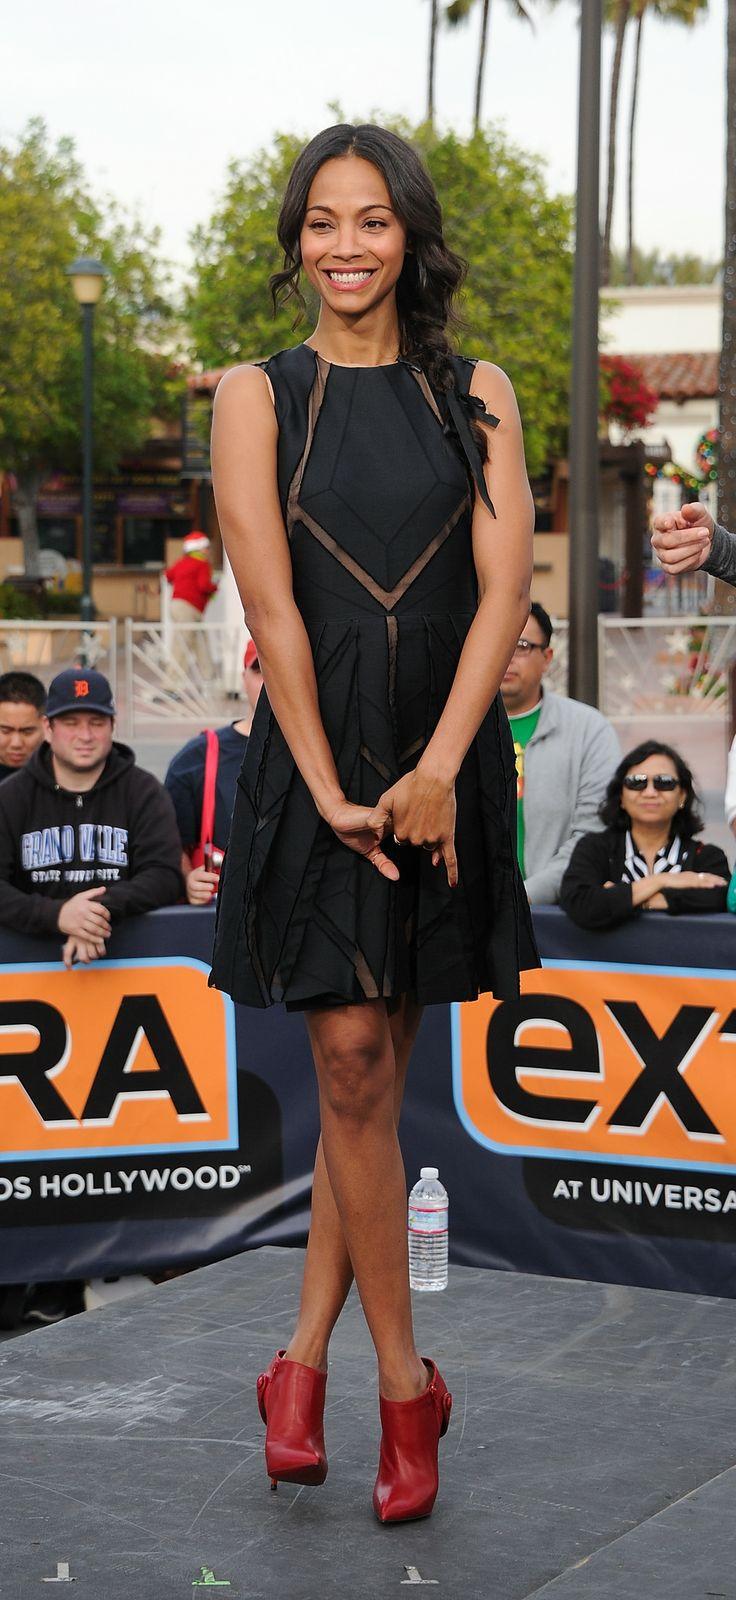 Zoe Saldana wears ELIE SAAB Resort 2014 to her 'Extra' visit at Universal Studios Hollywood.